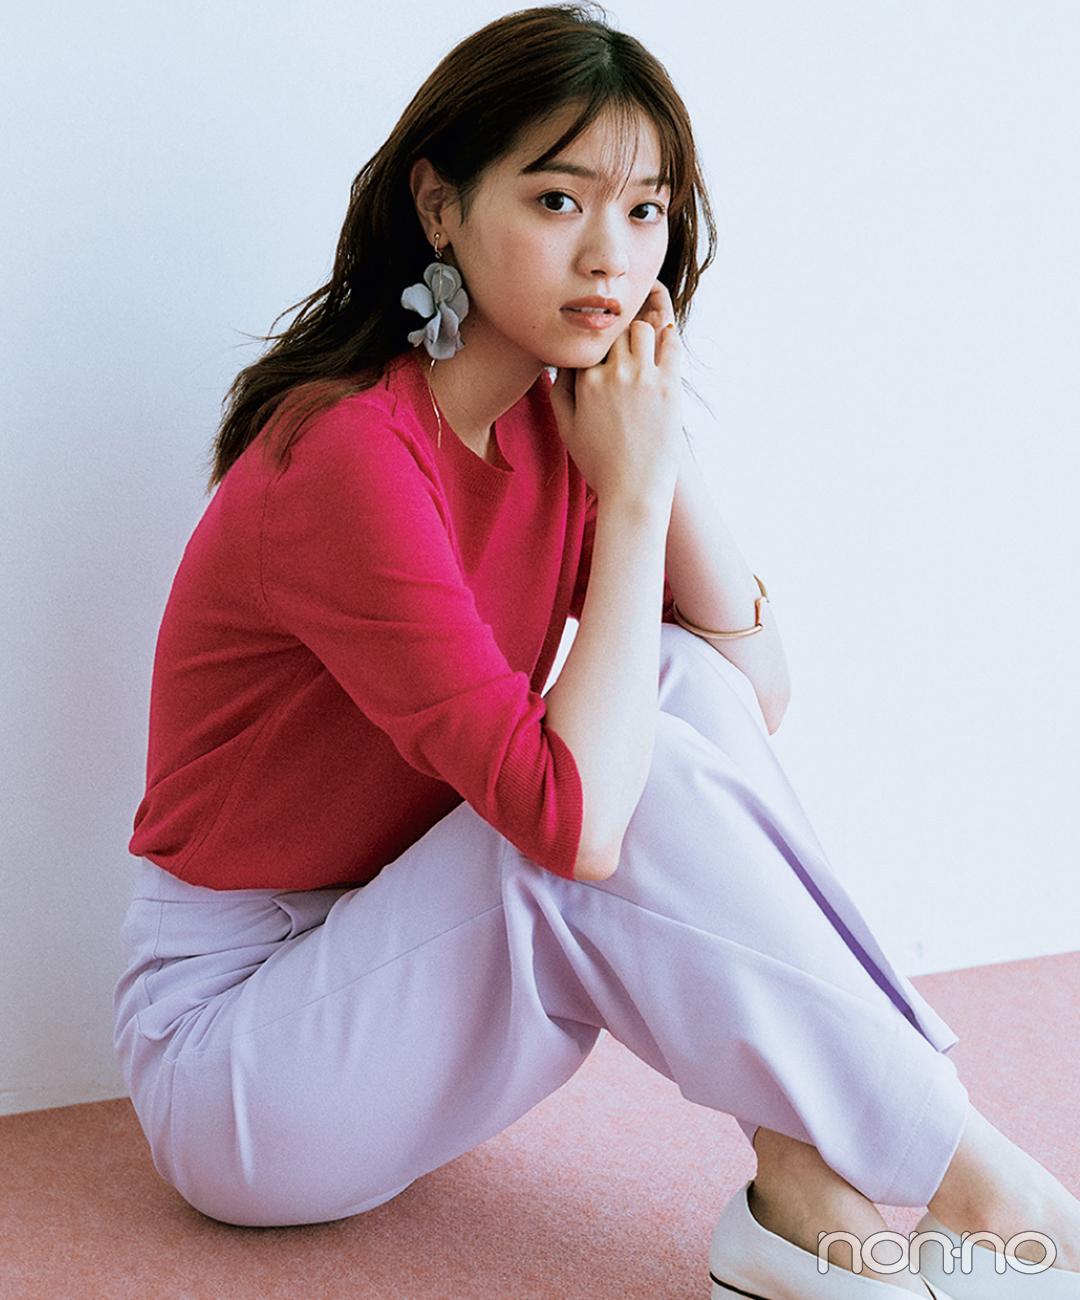 Photo Gallery|モデル・西野七瀬の最新フォトギャラリーを見る_1_22